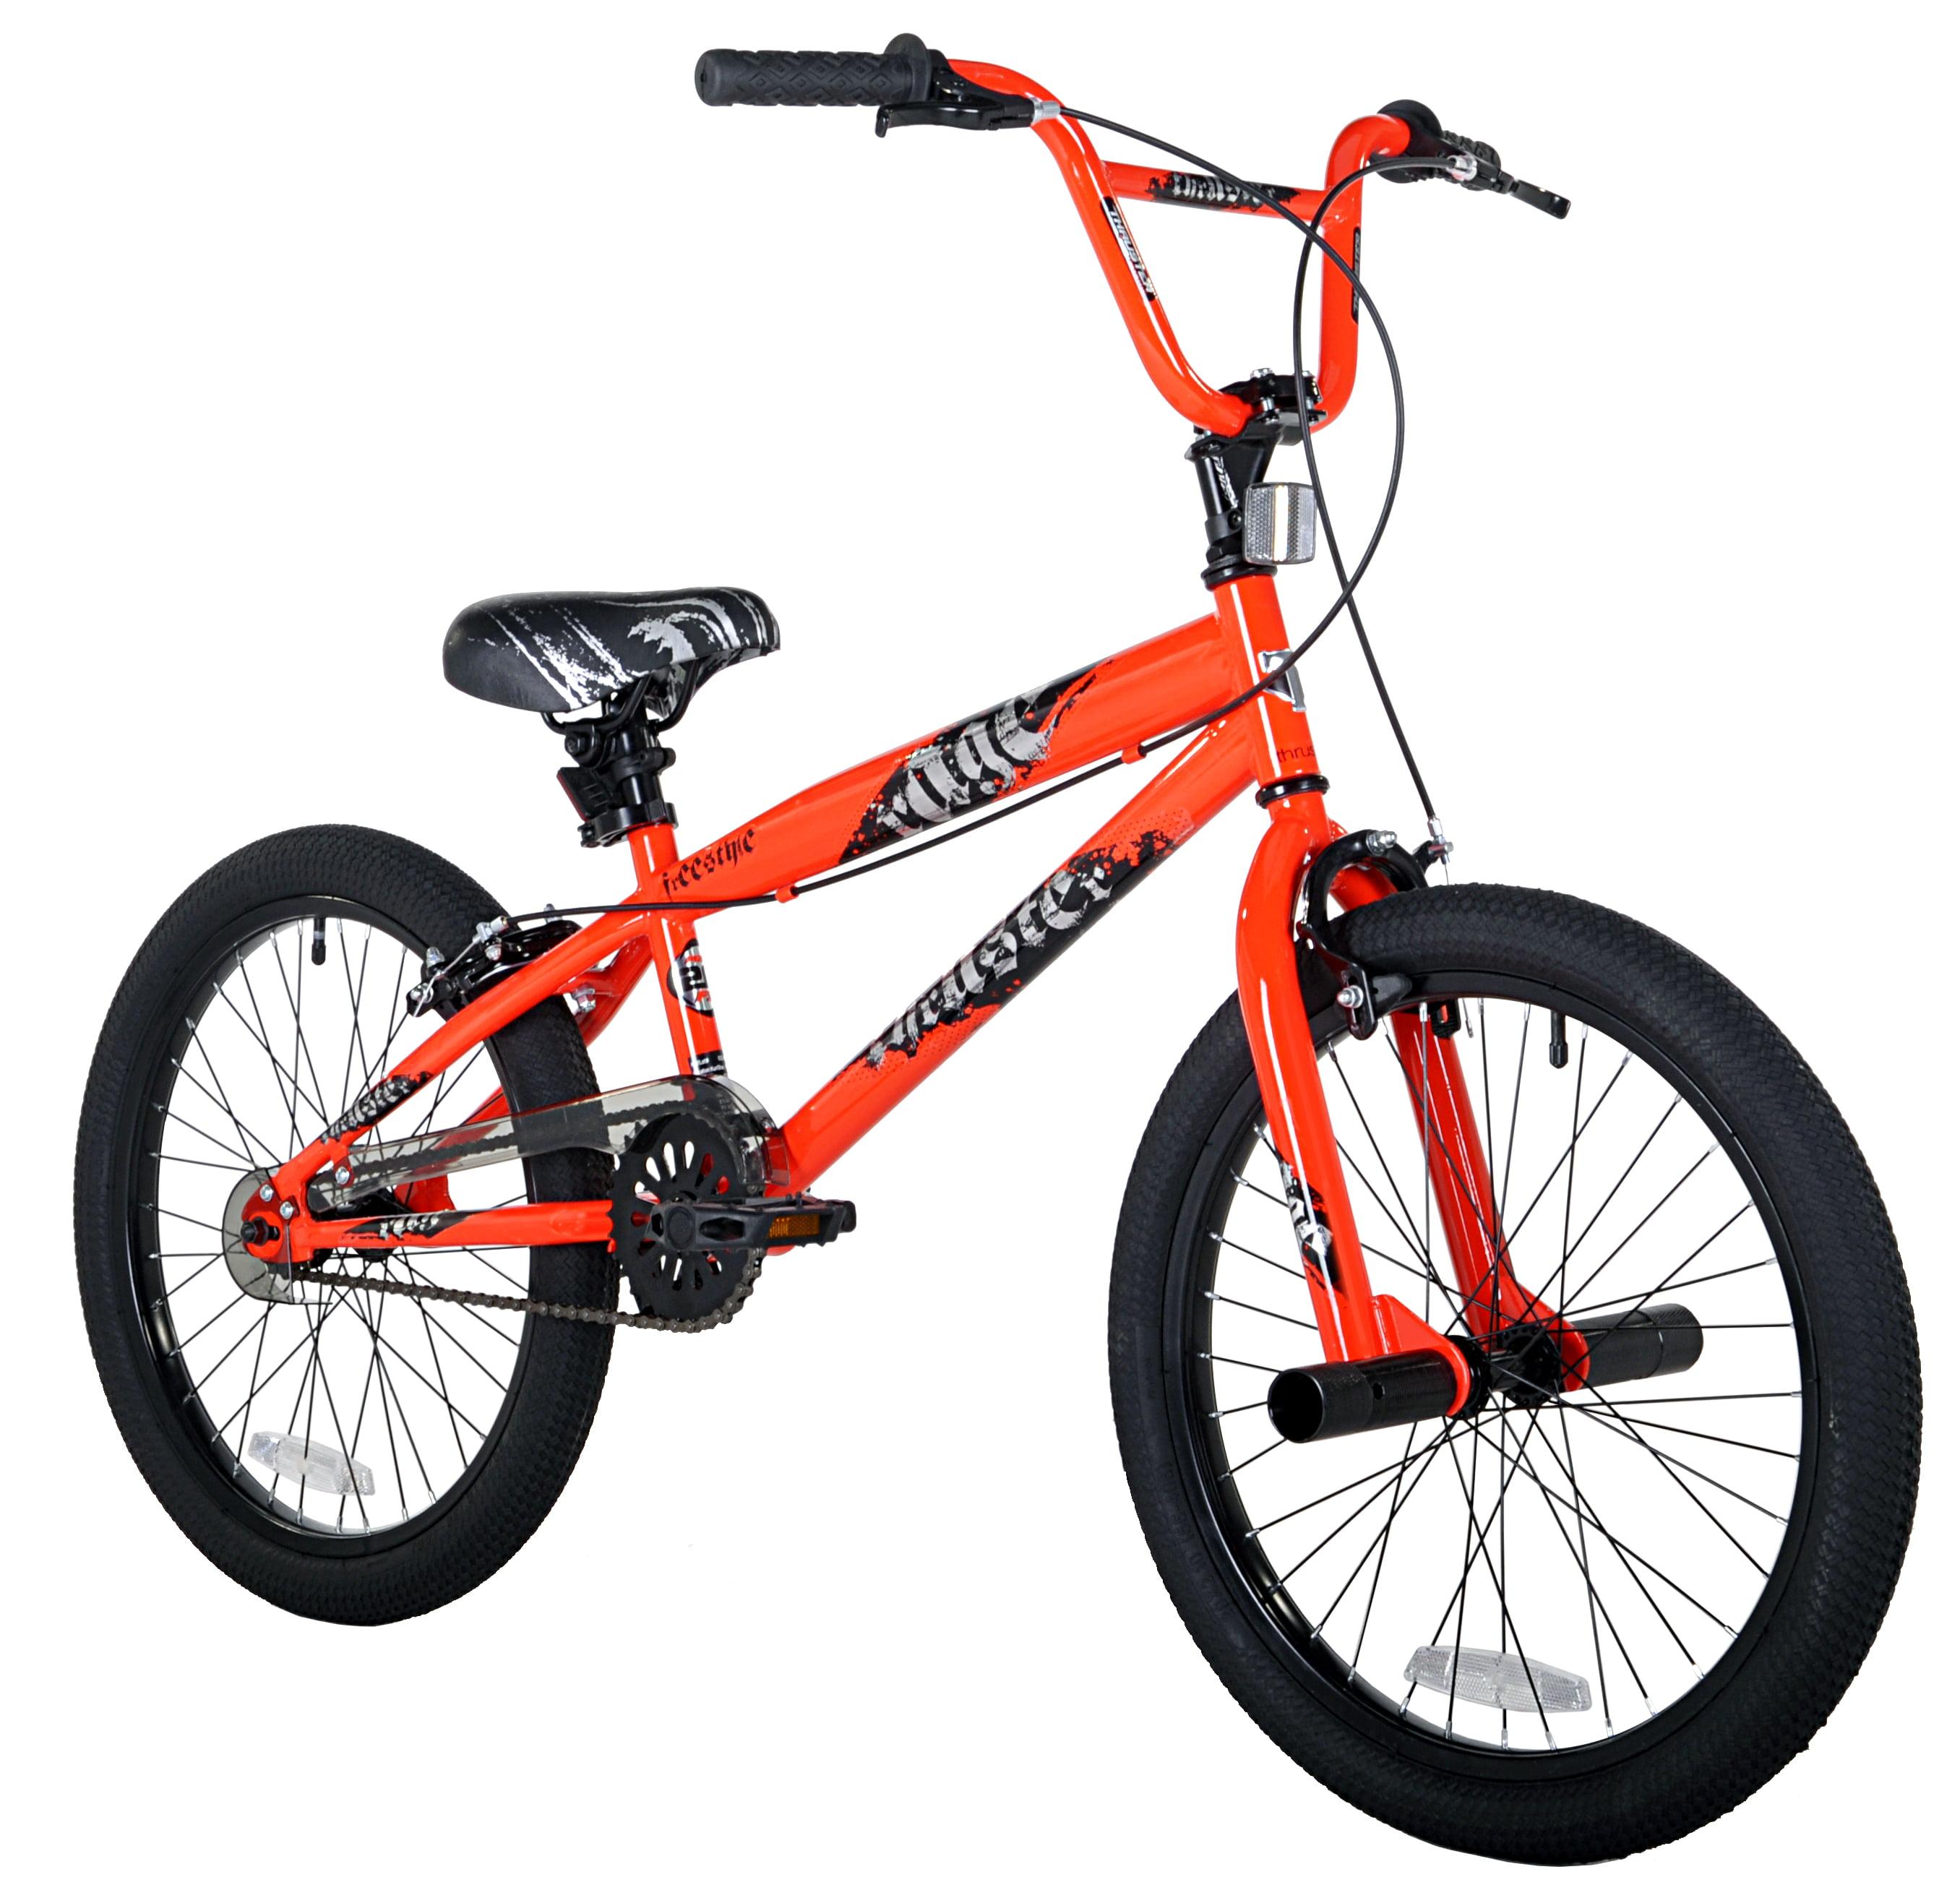 Boys 20 Inch Bike >> Kent 20 Rage Bmx Boy S Bike Orange For Height Sizes 4 2 And Up